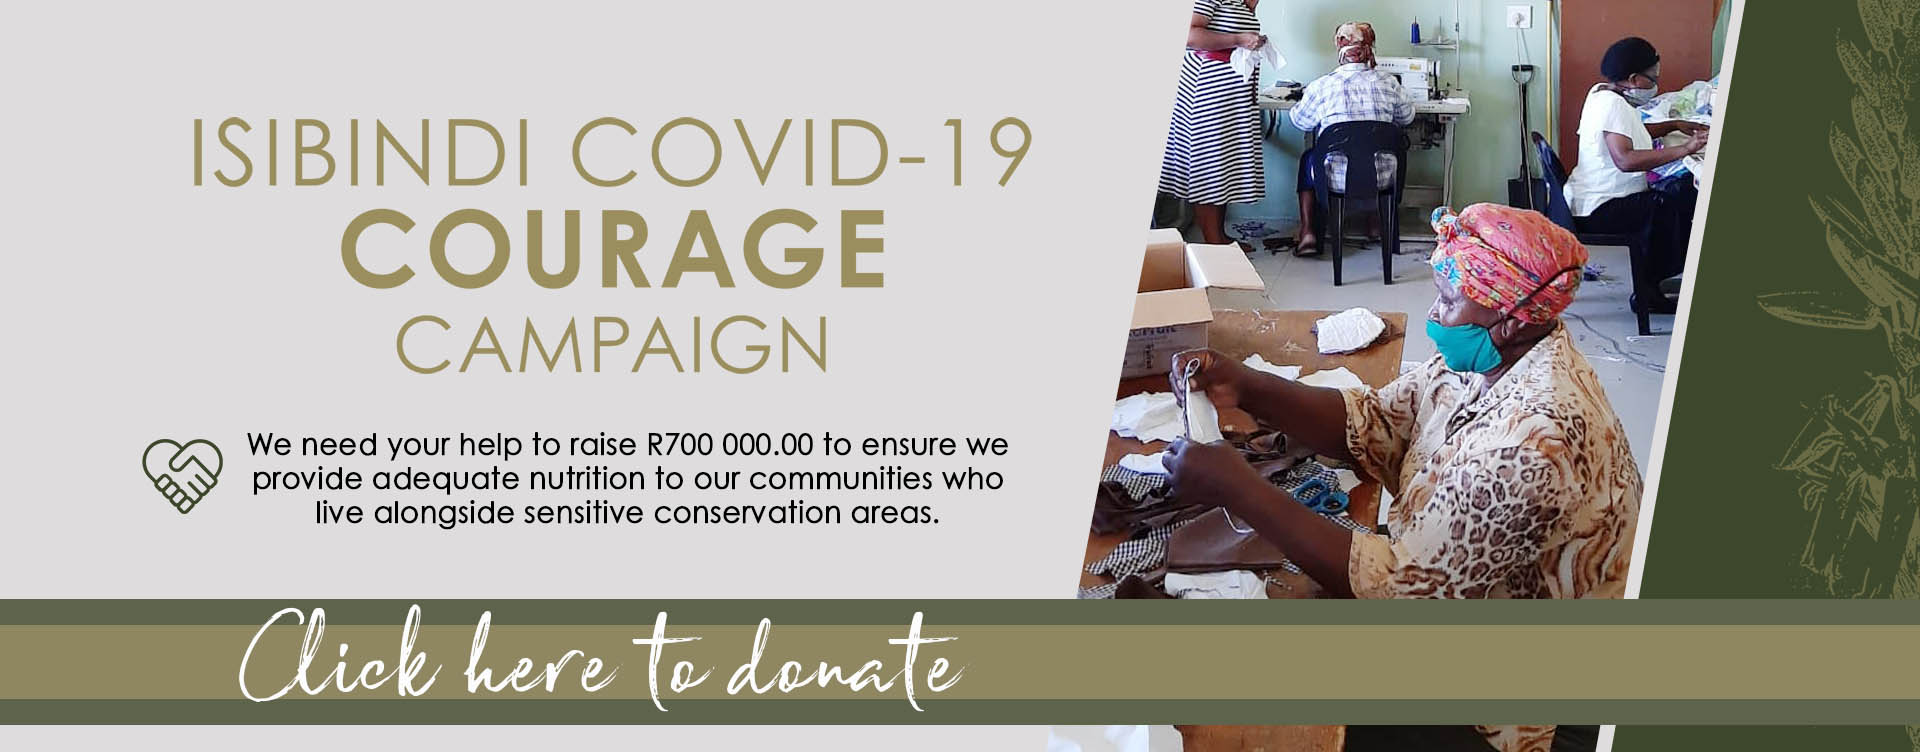 FB Covid-19 Campaign V2-D2